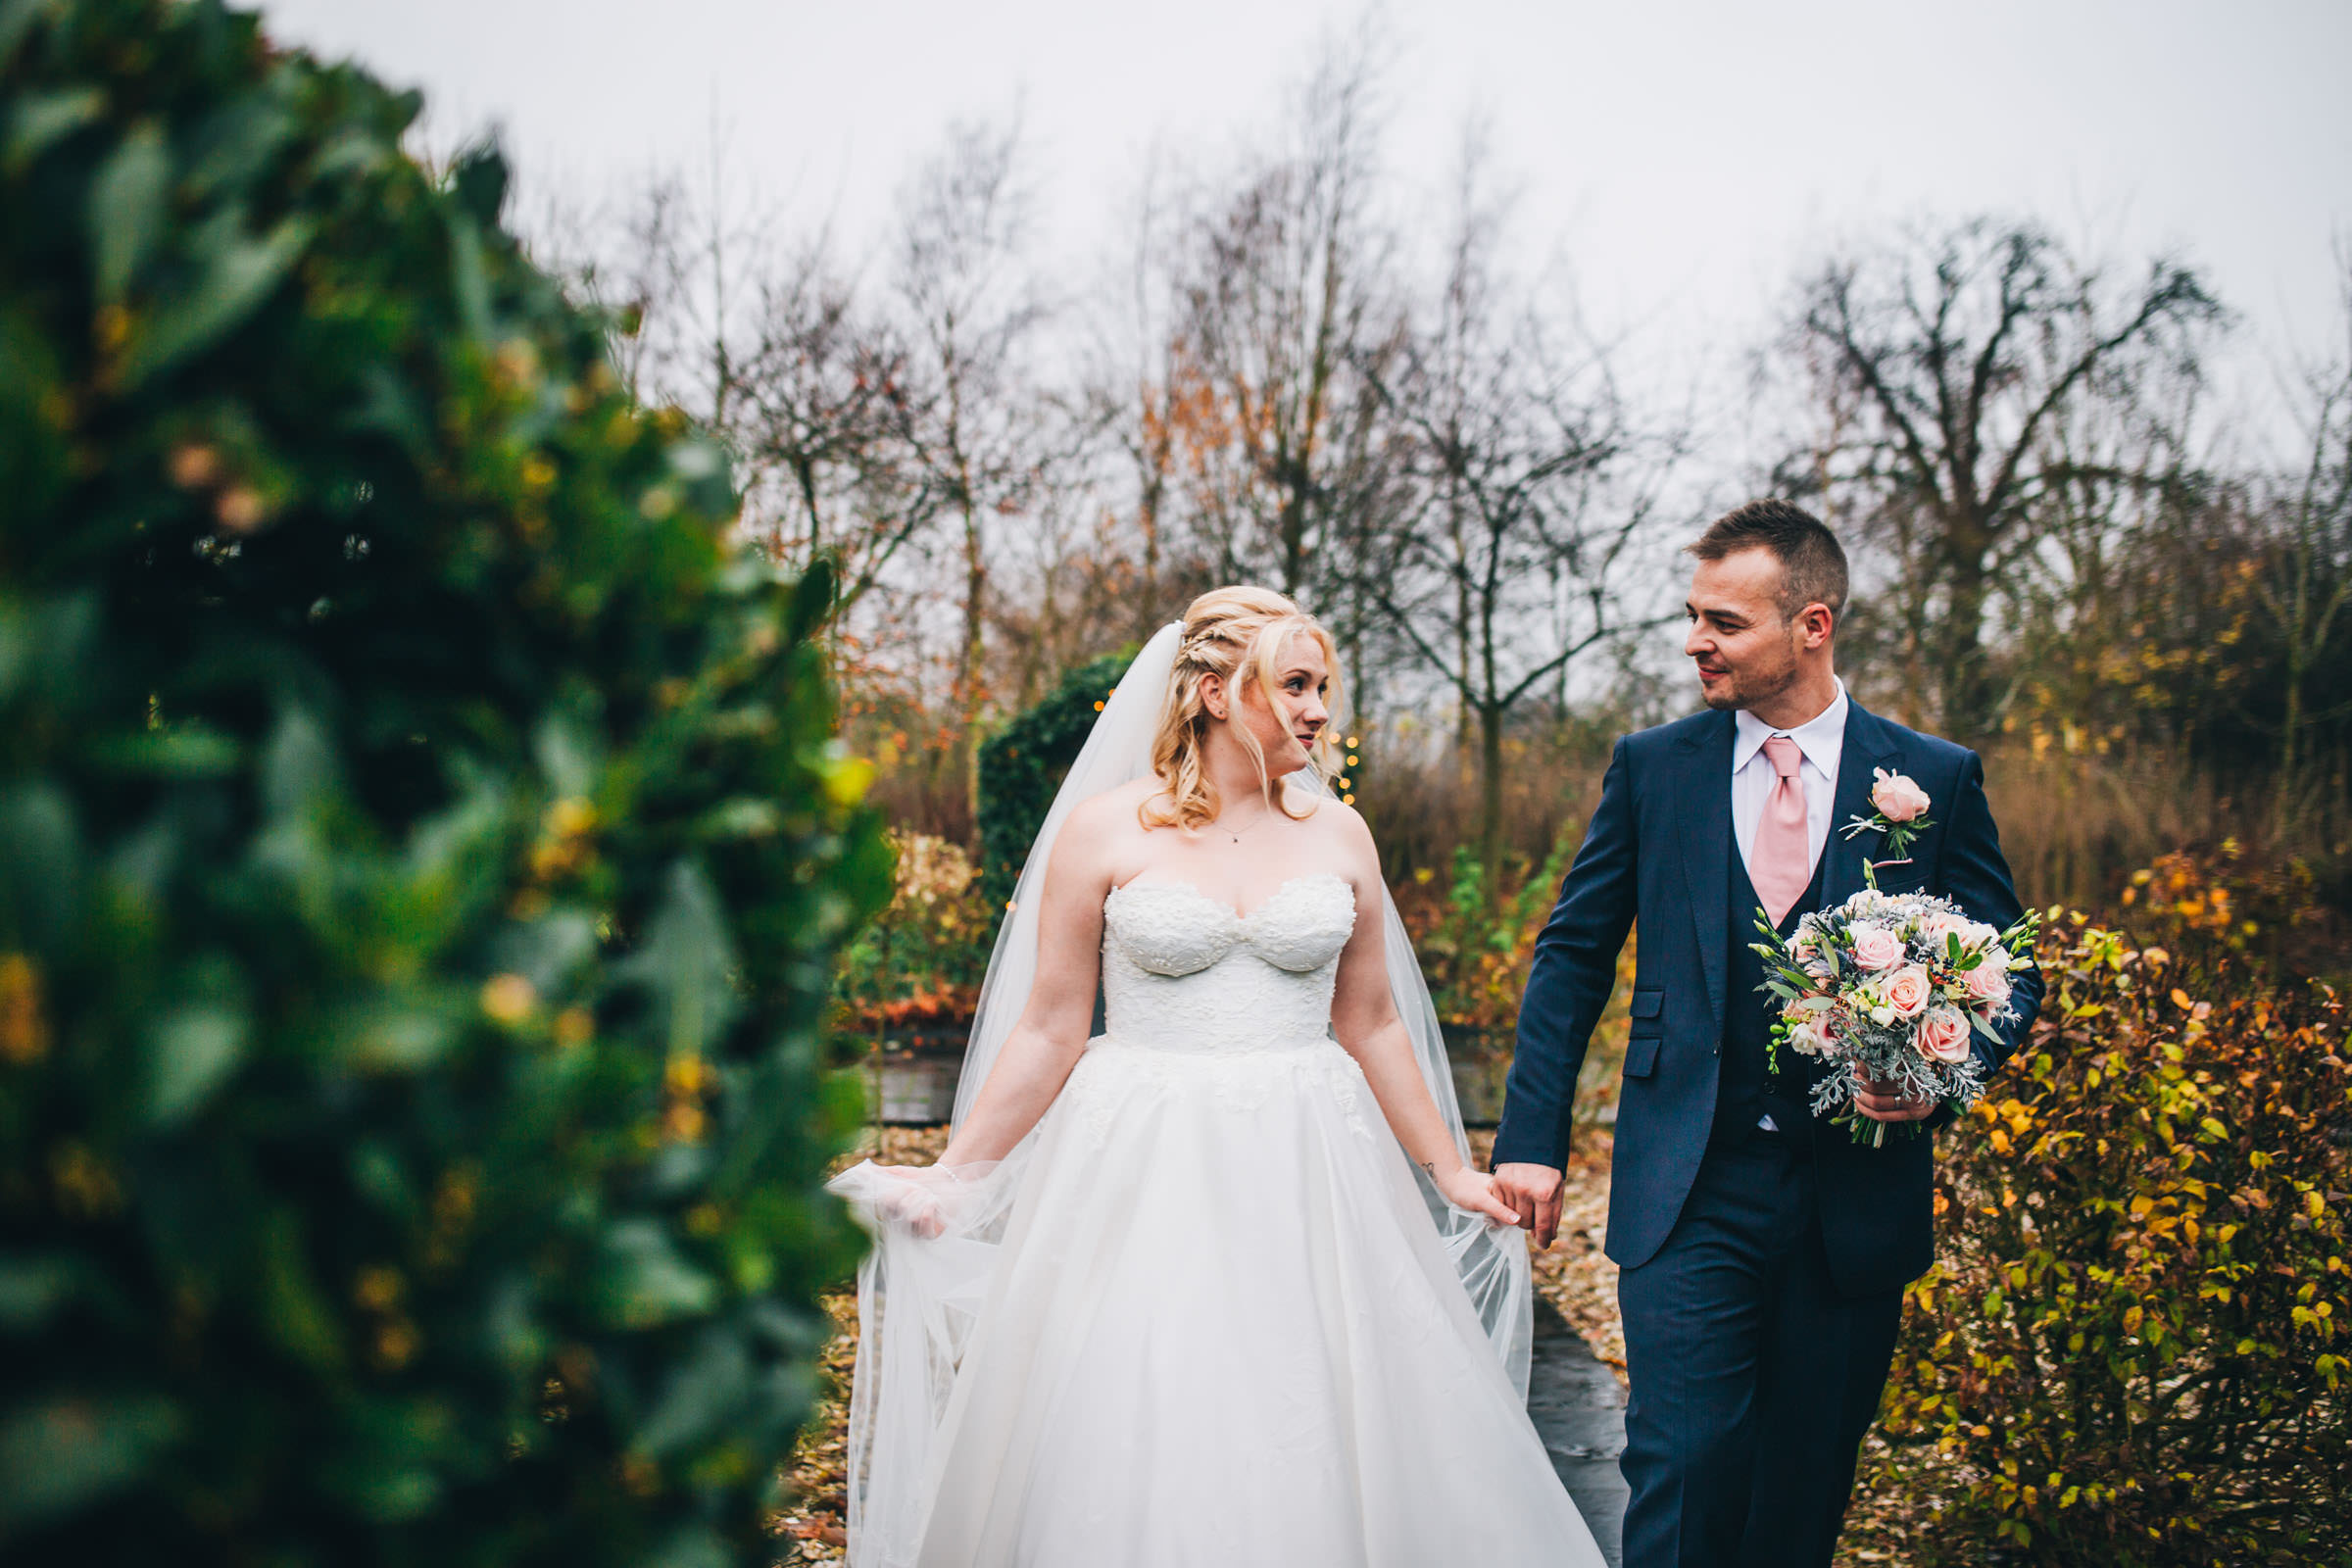 bride looks at groom - cheshire wedding